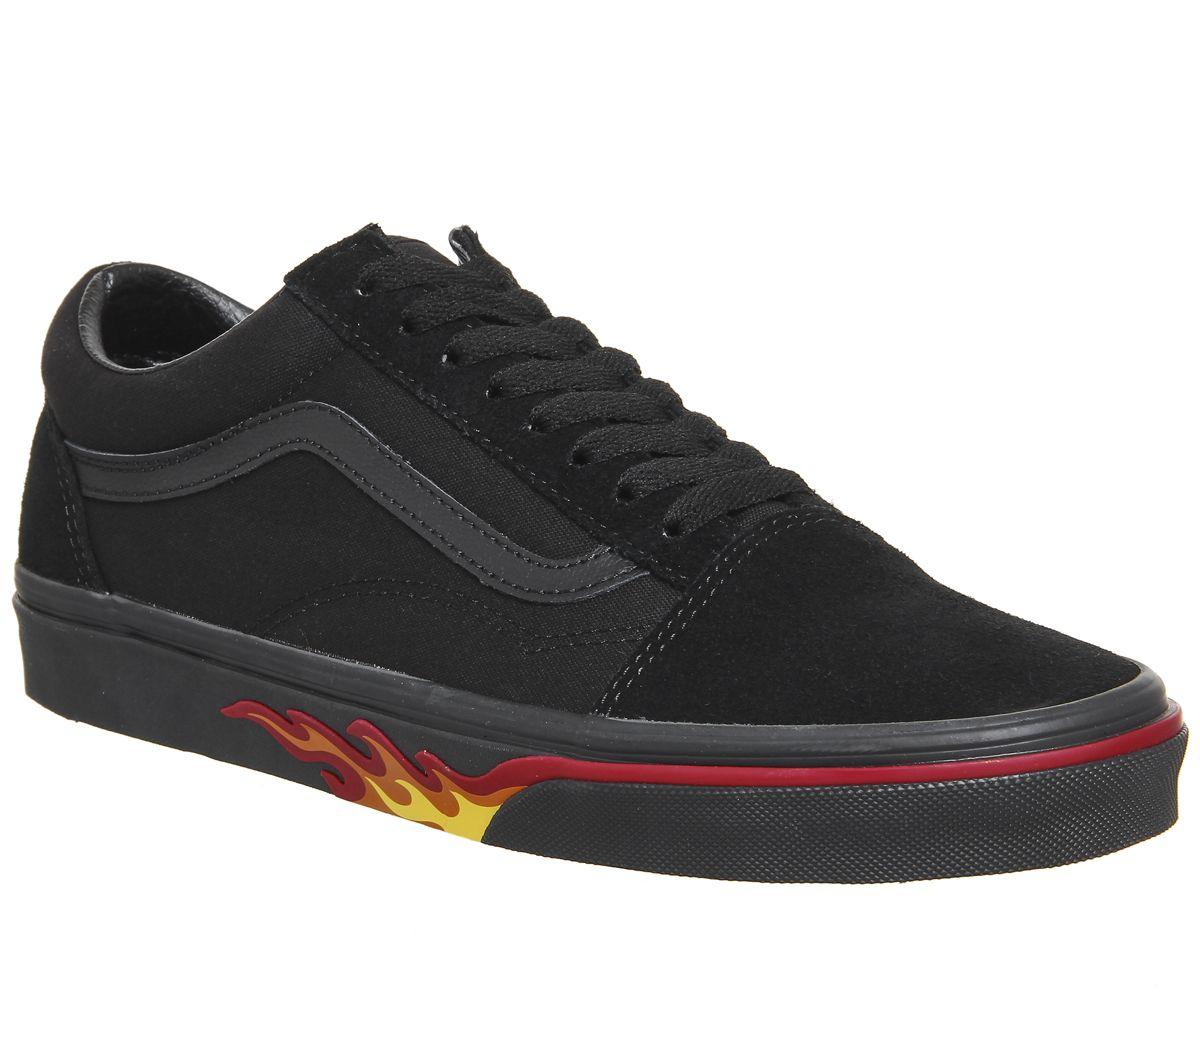 b854ca08da Vans Old Skool Trainers Black Flame Wall - Unisex Sports